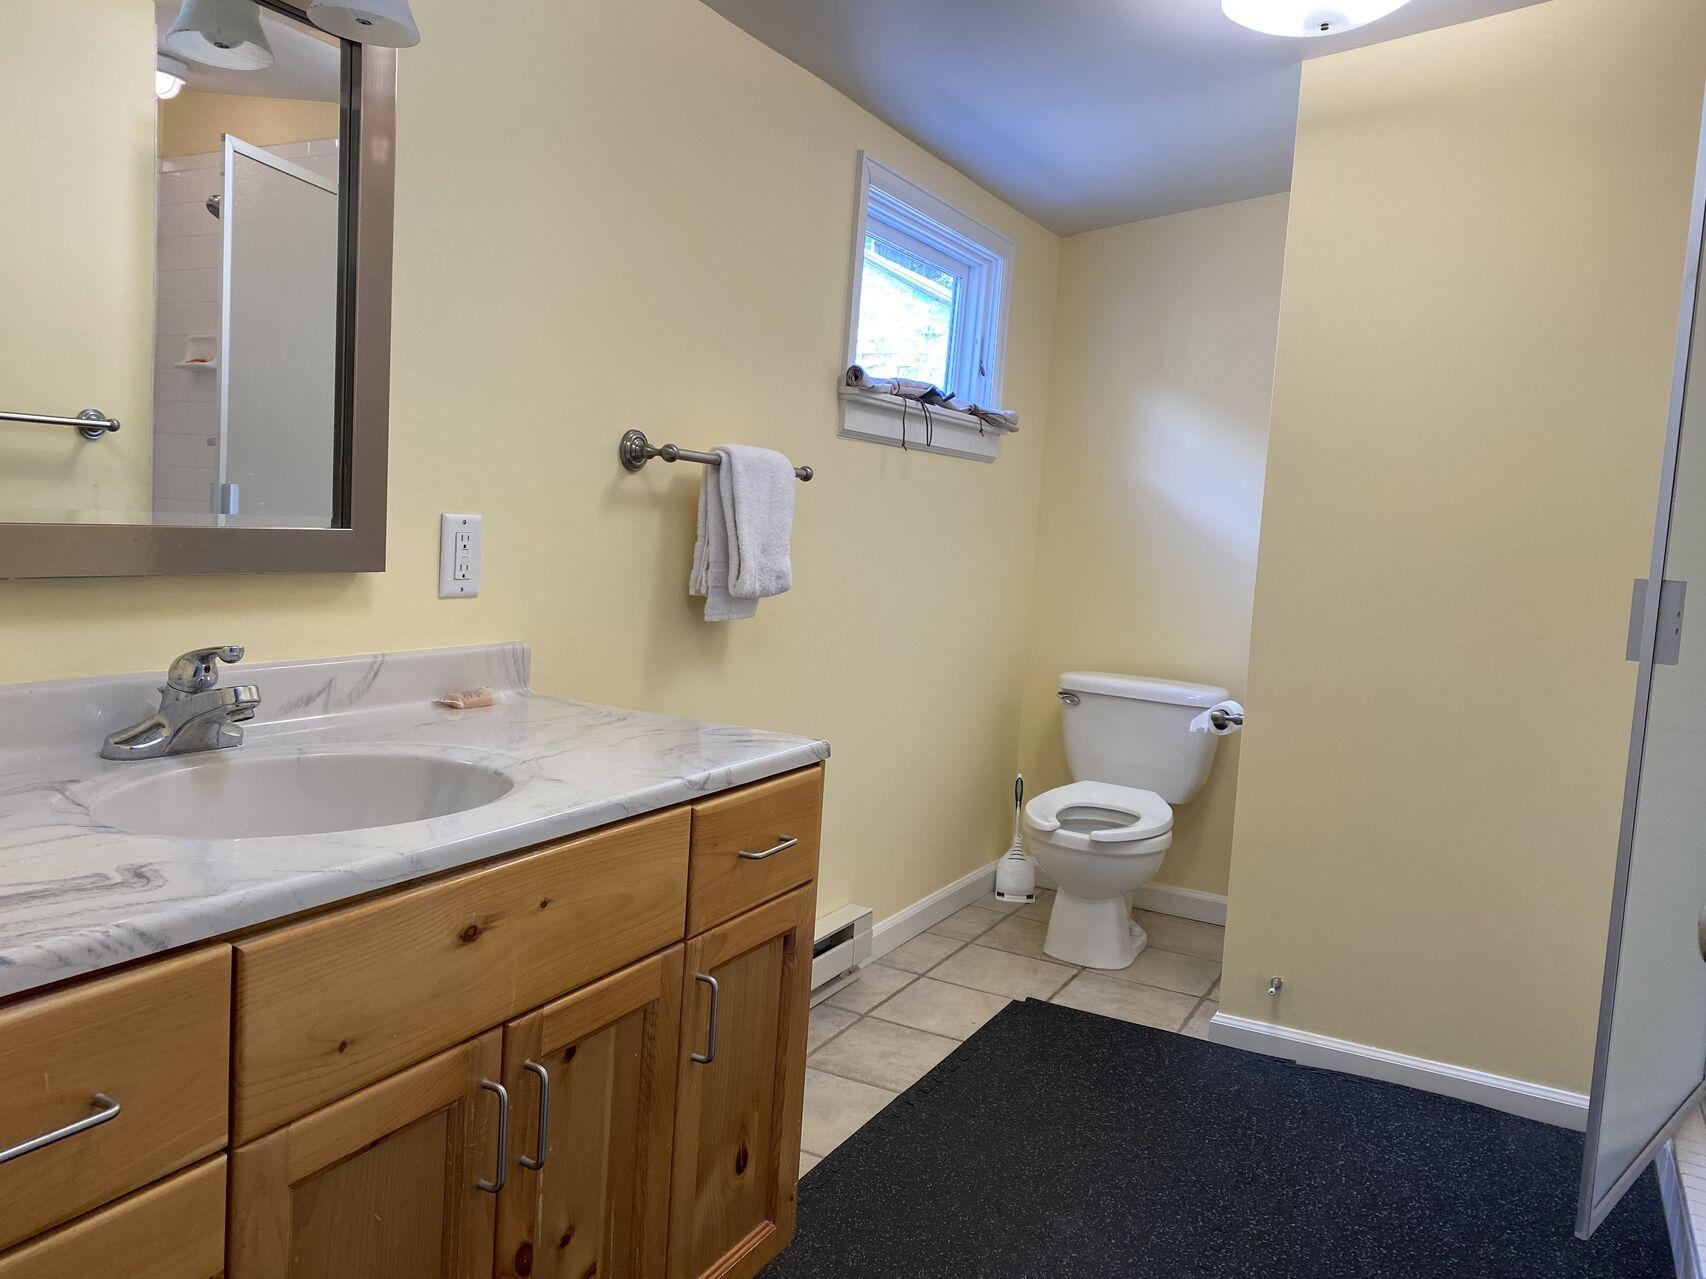 Bathroom with vanity sink and toilet.